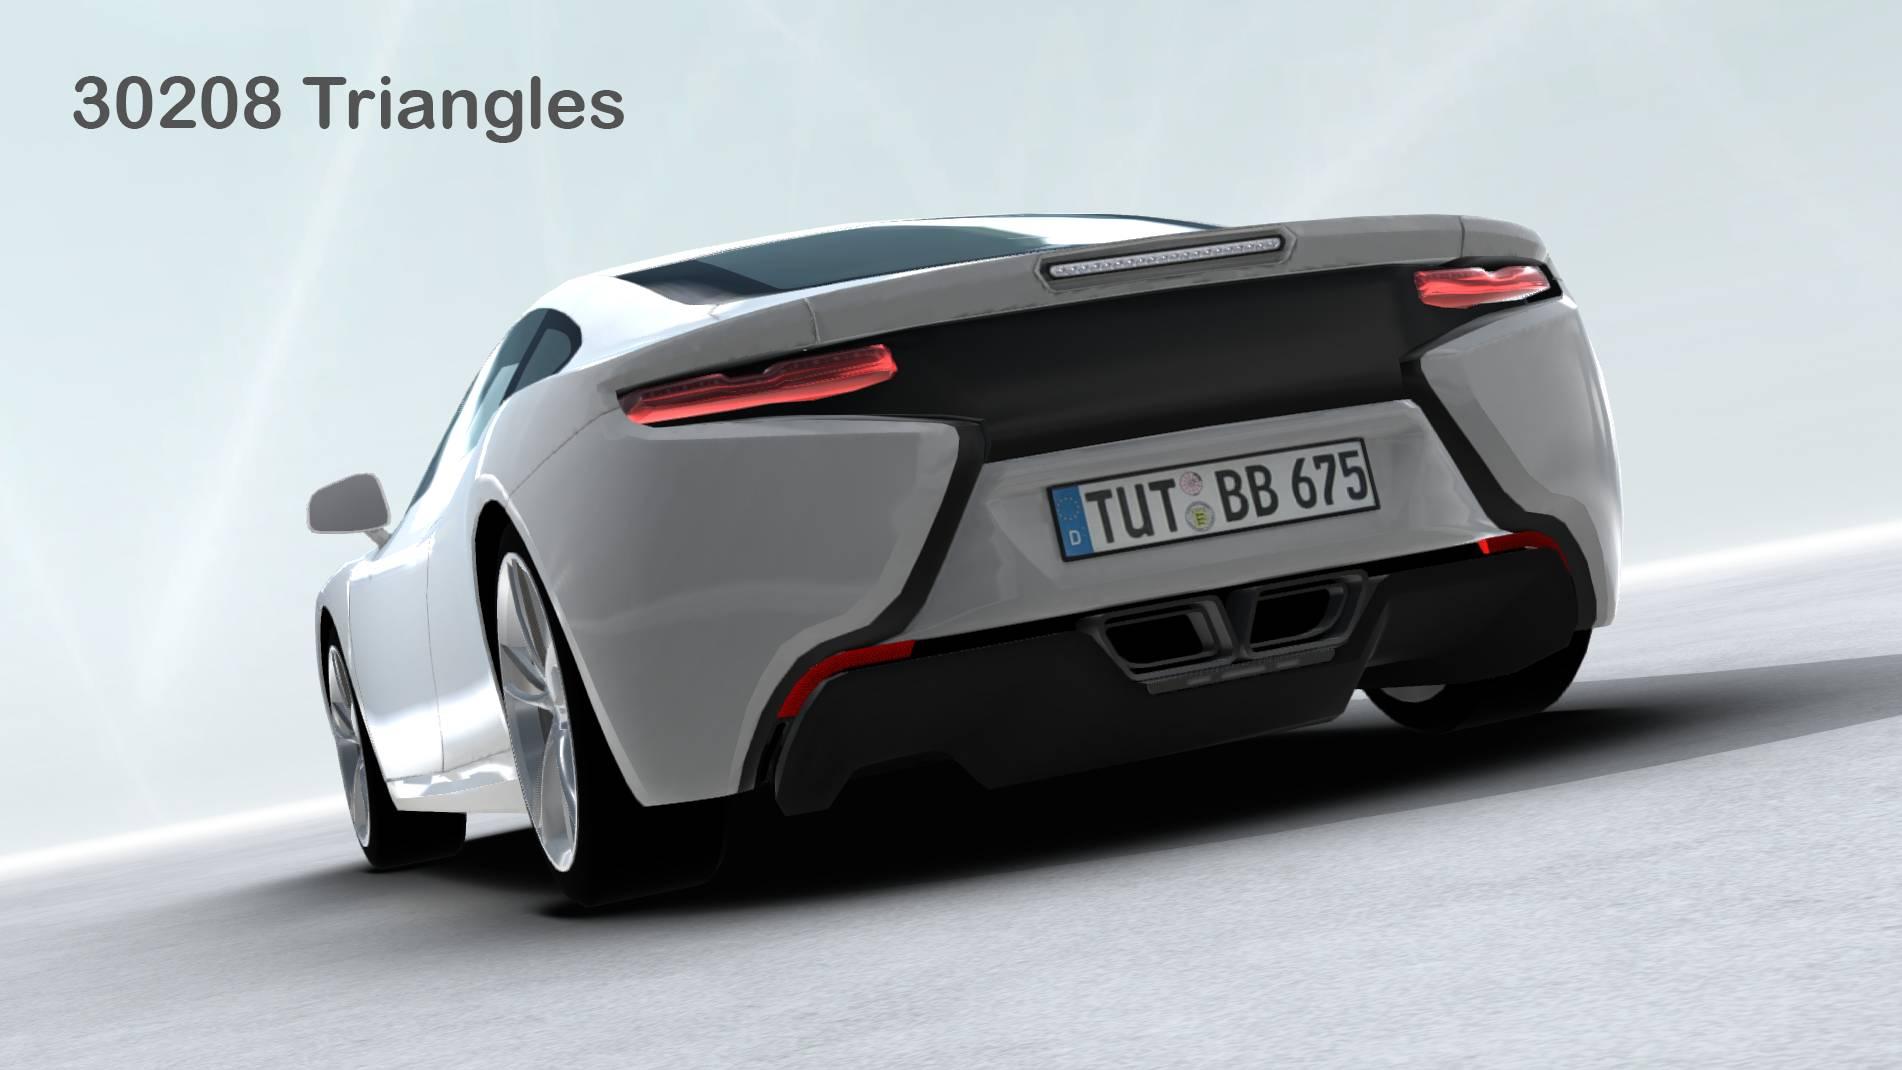 generic sports car realtime 3d model 3ds max fbx c4d lwo ma mb other obj 217744